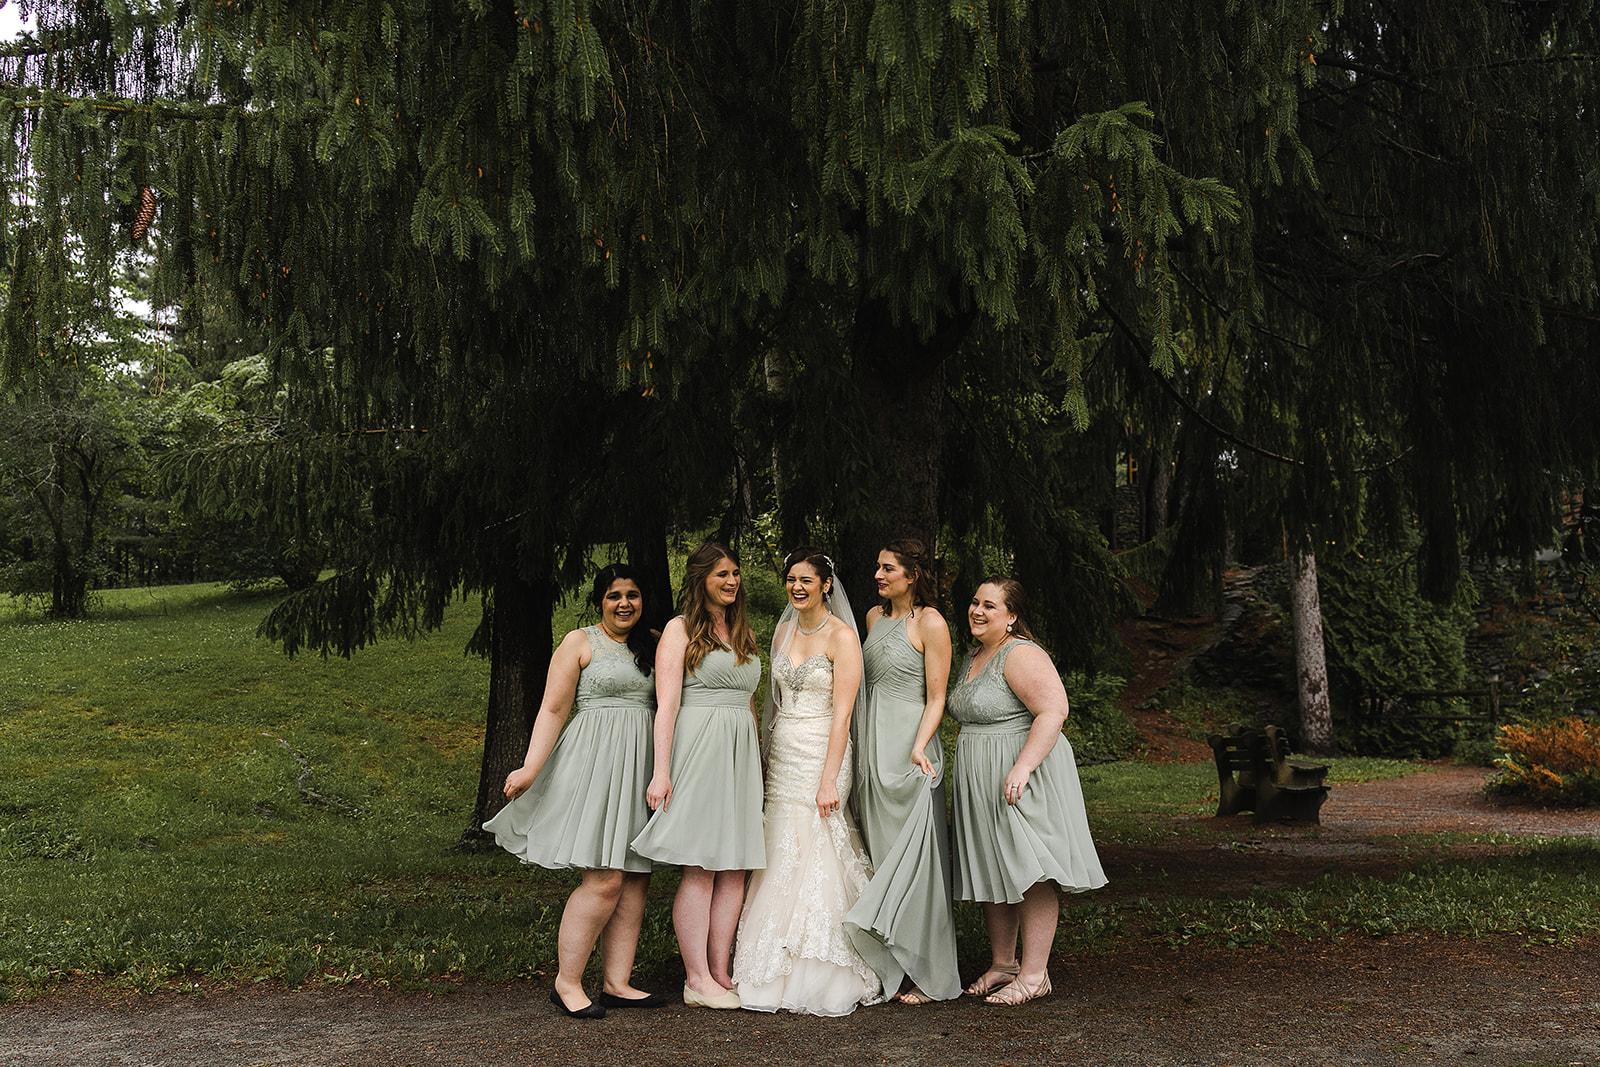 Bangor Maine Wedding and Coastal Maine Portrait Session 38